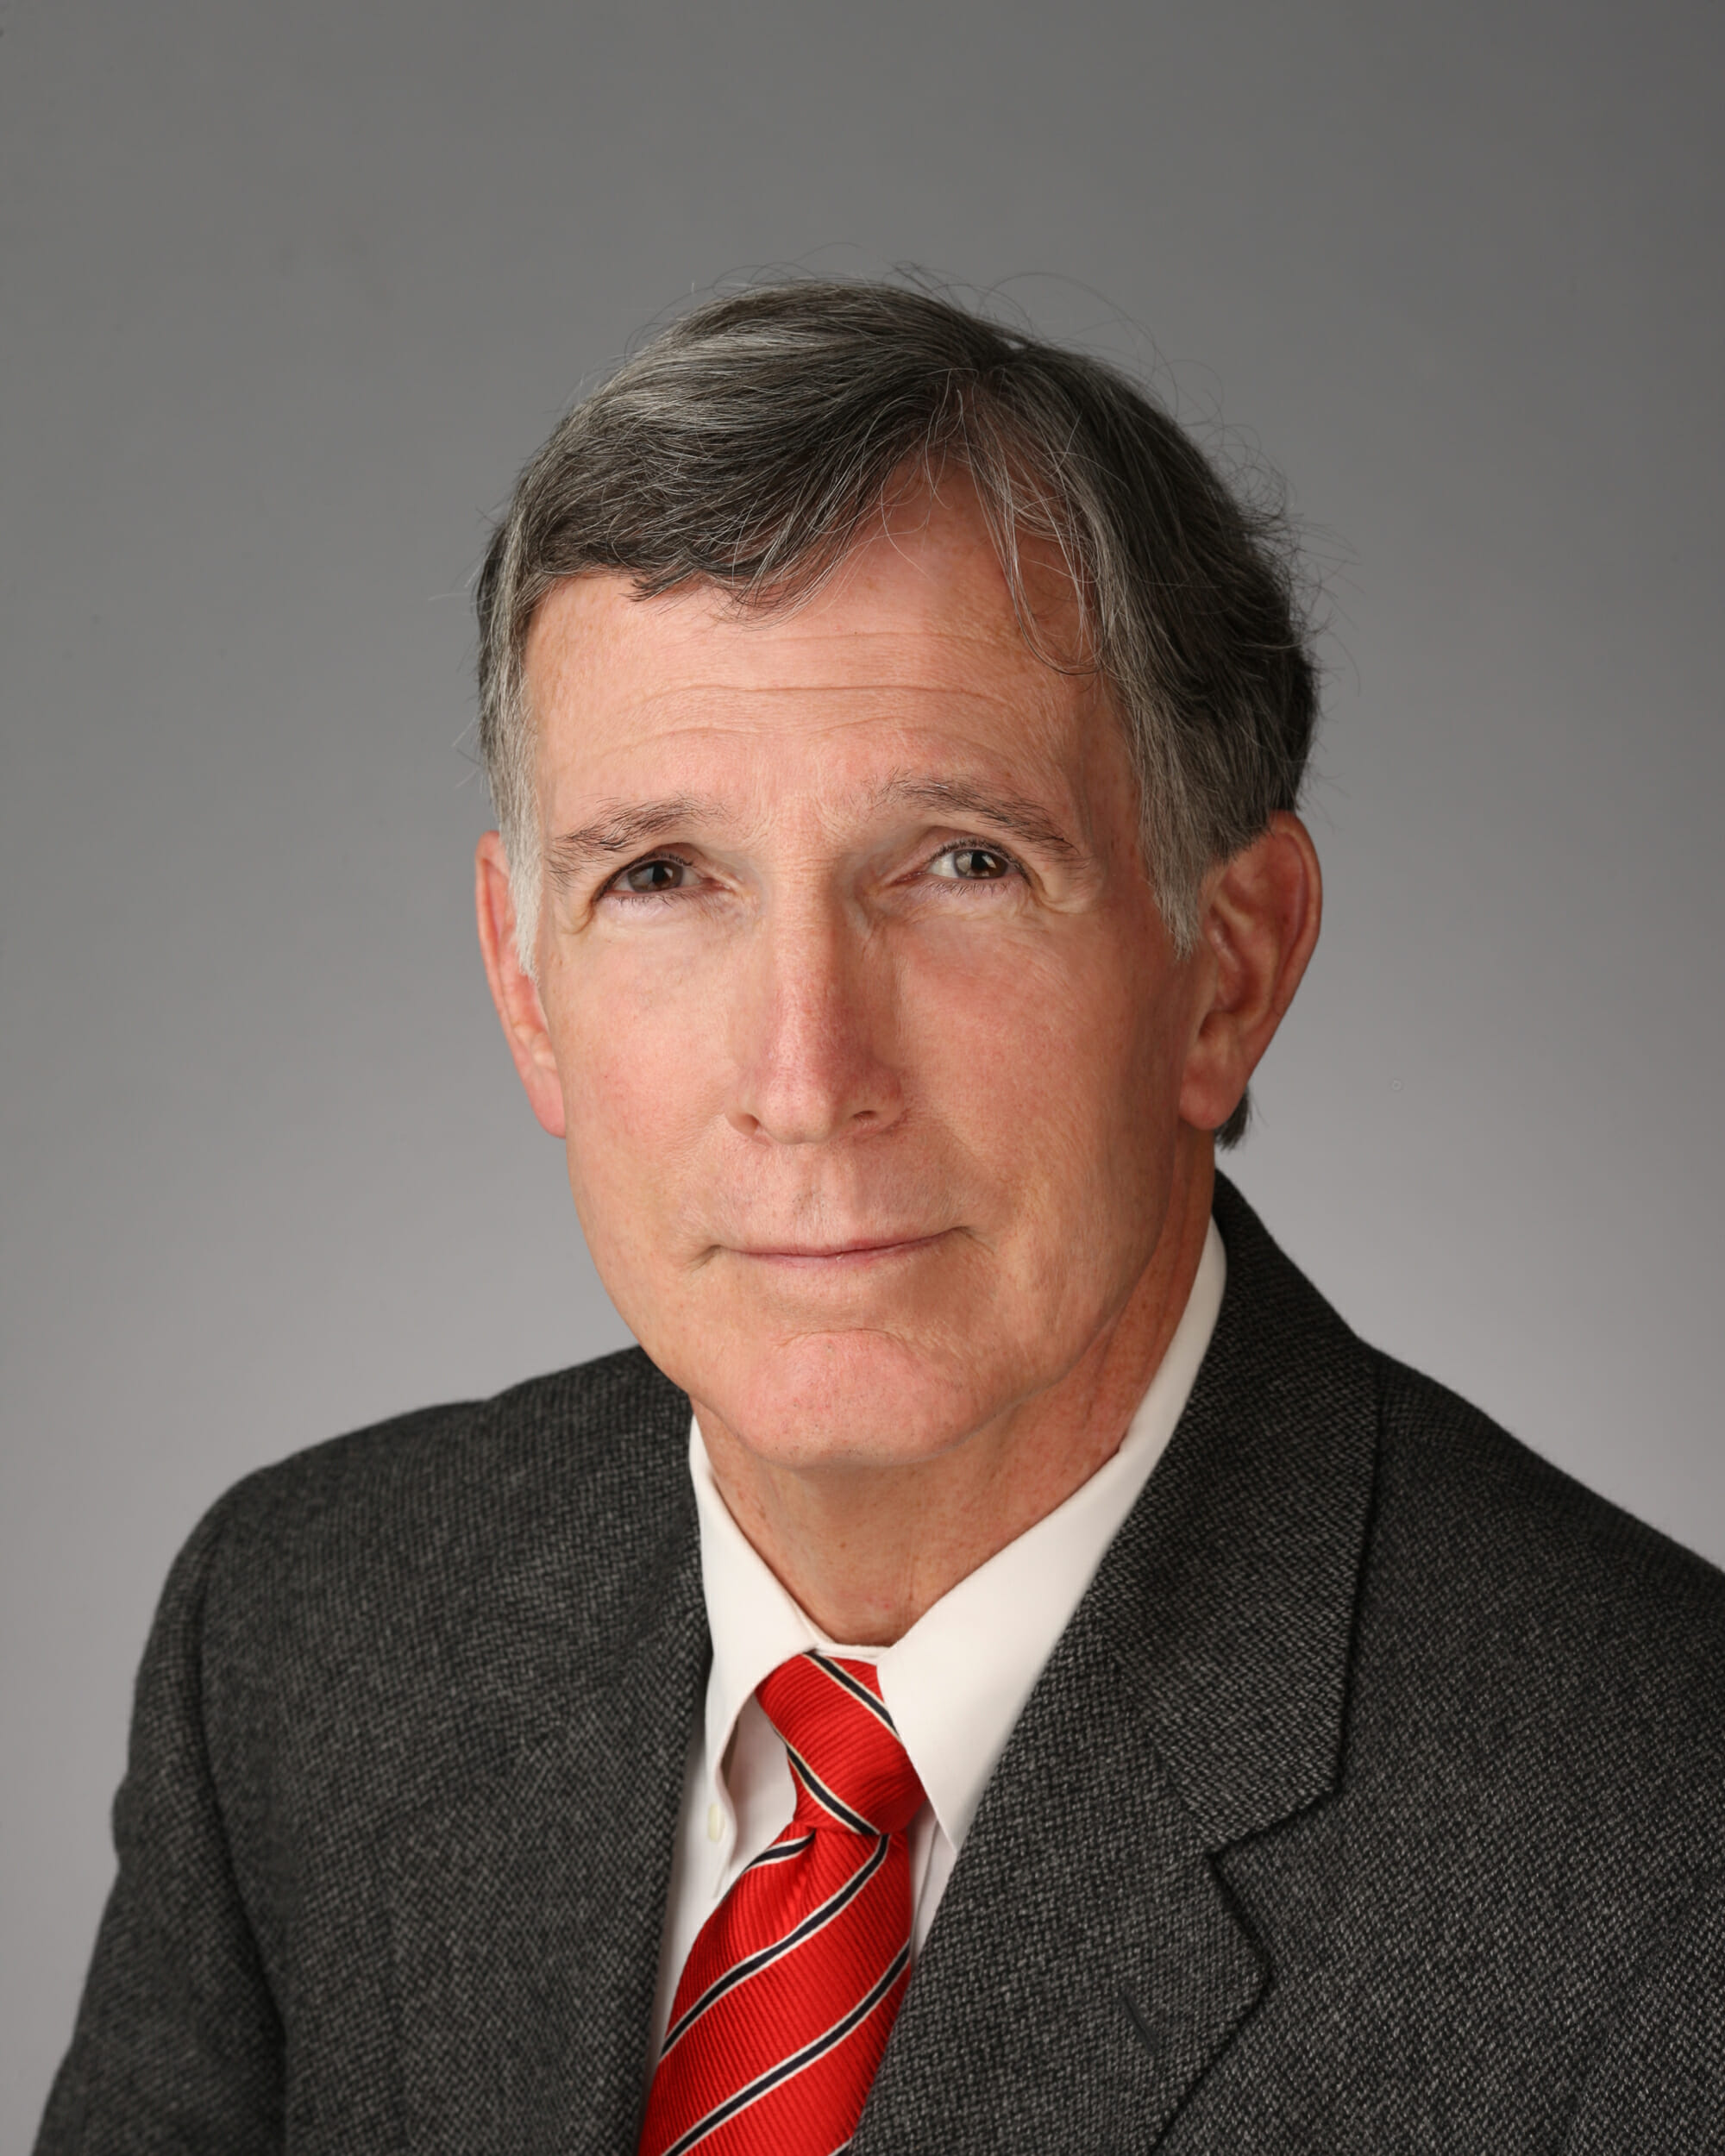 Jim McElroy CFA®